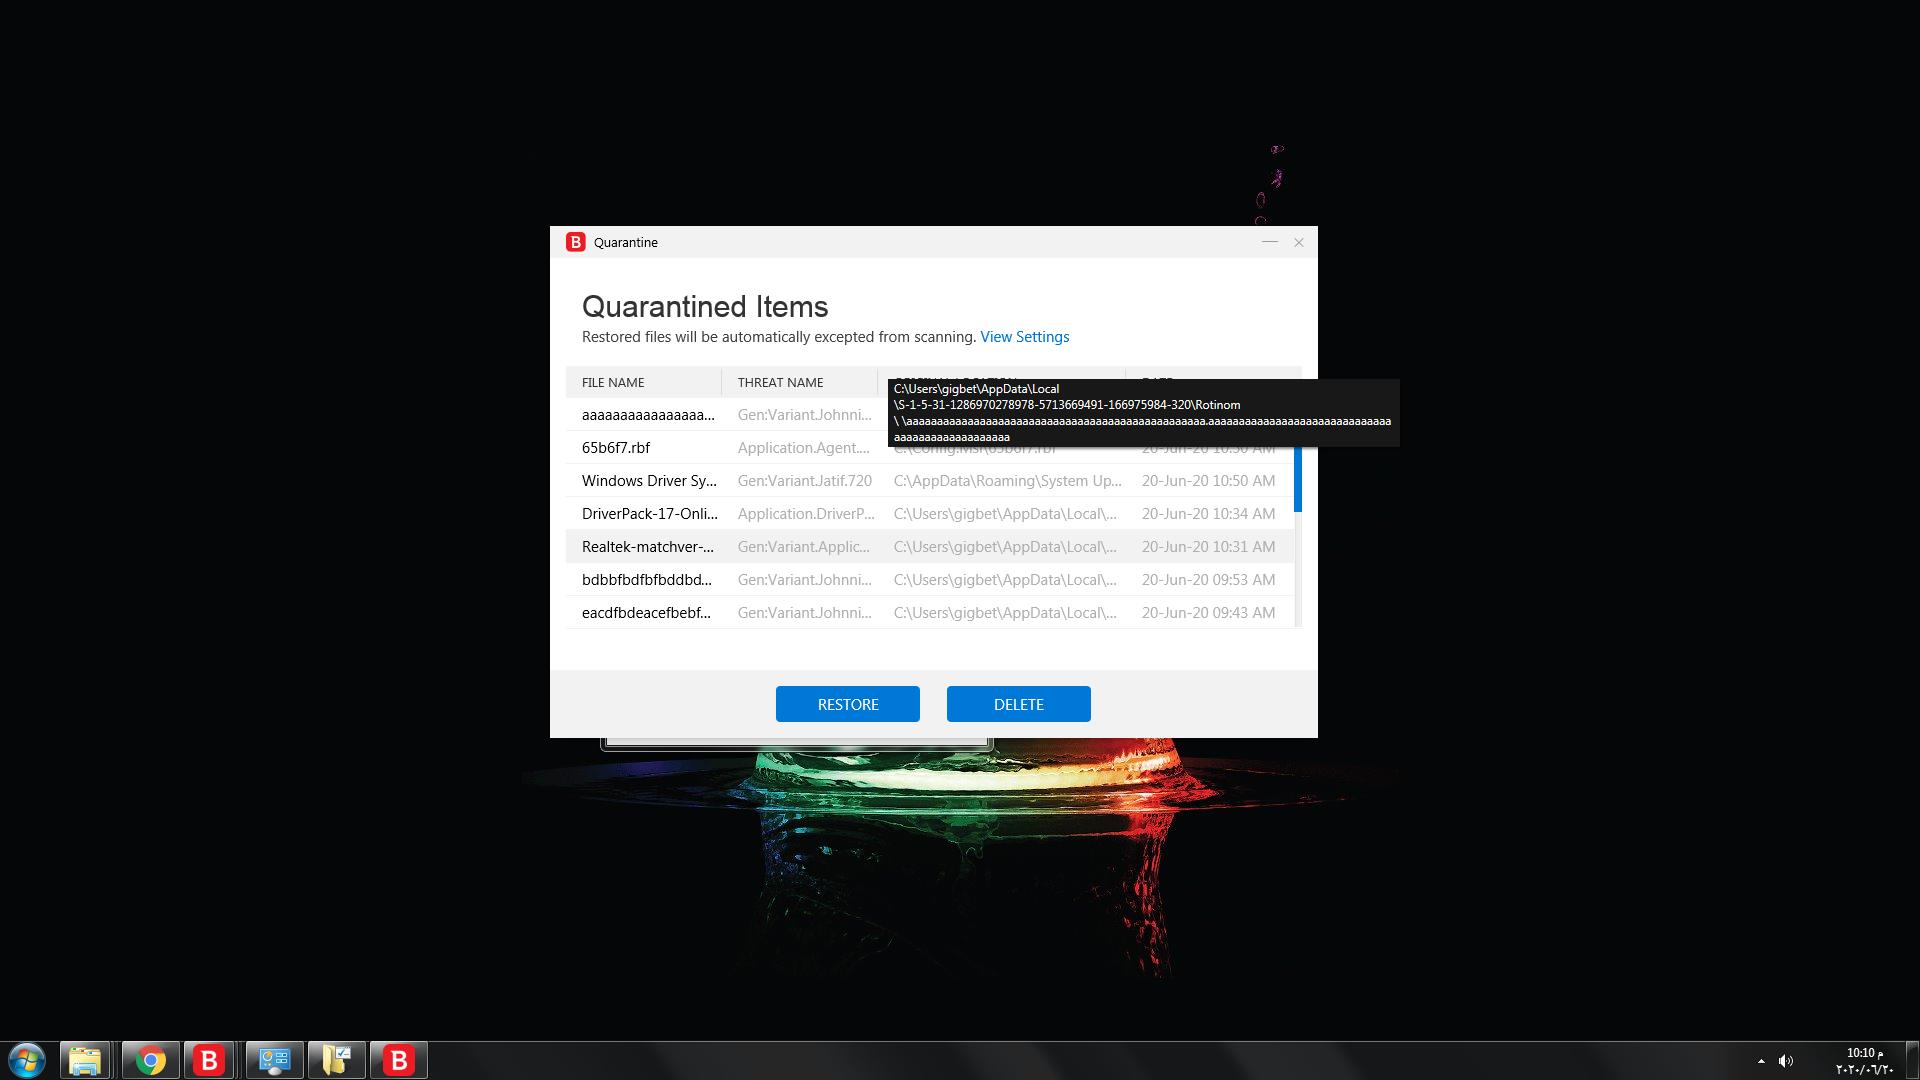 Desktop Screenshot 2020.06.20 - 22.09.58.29.png